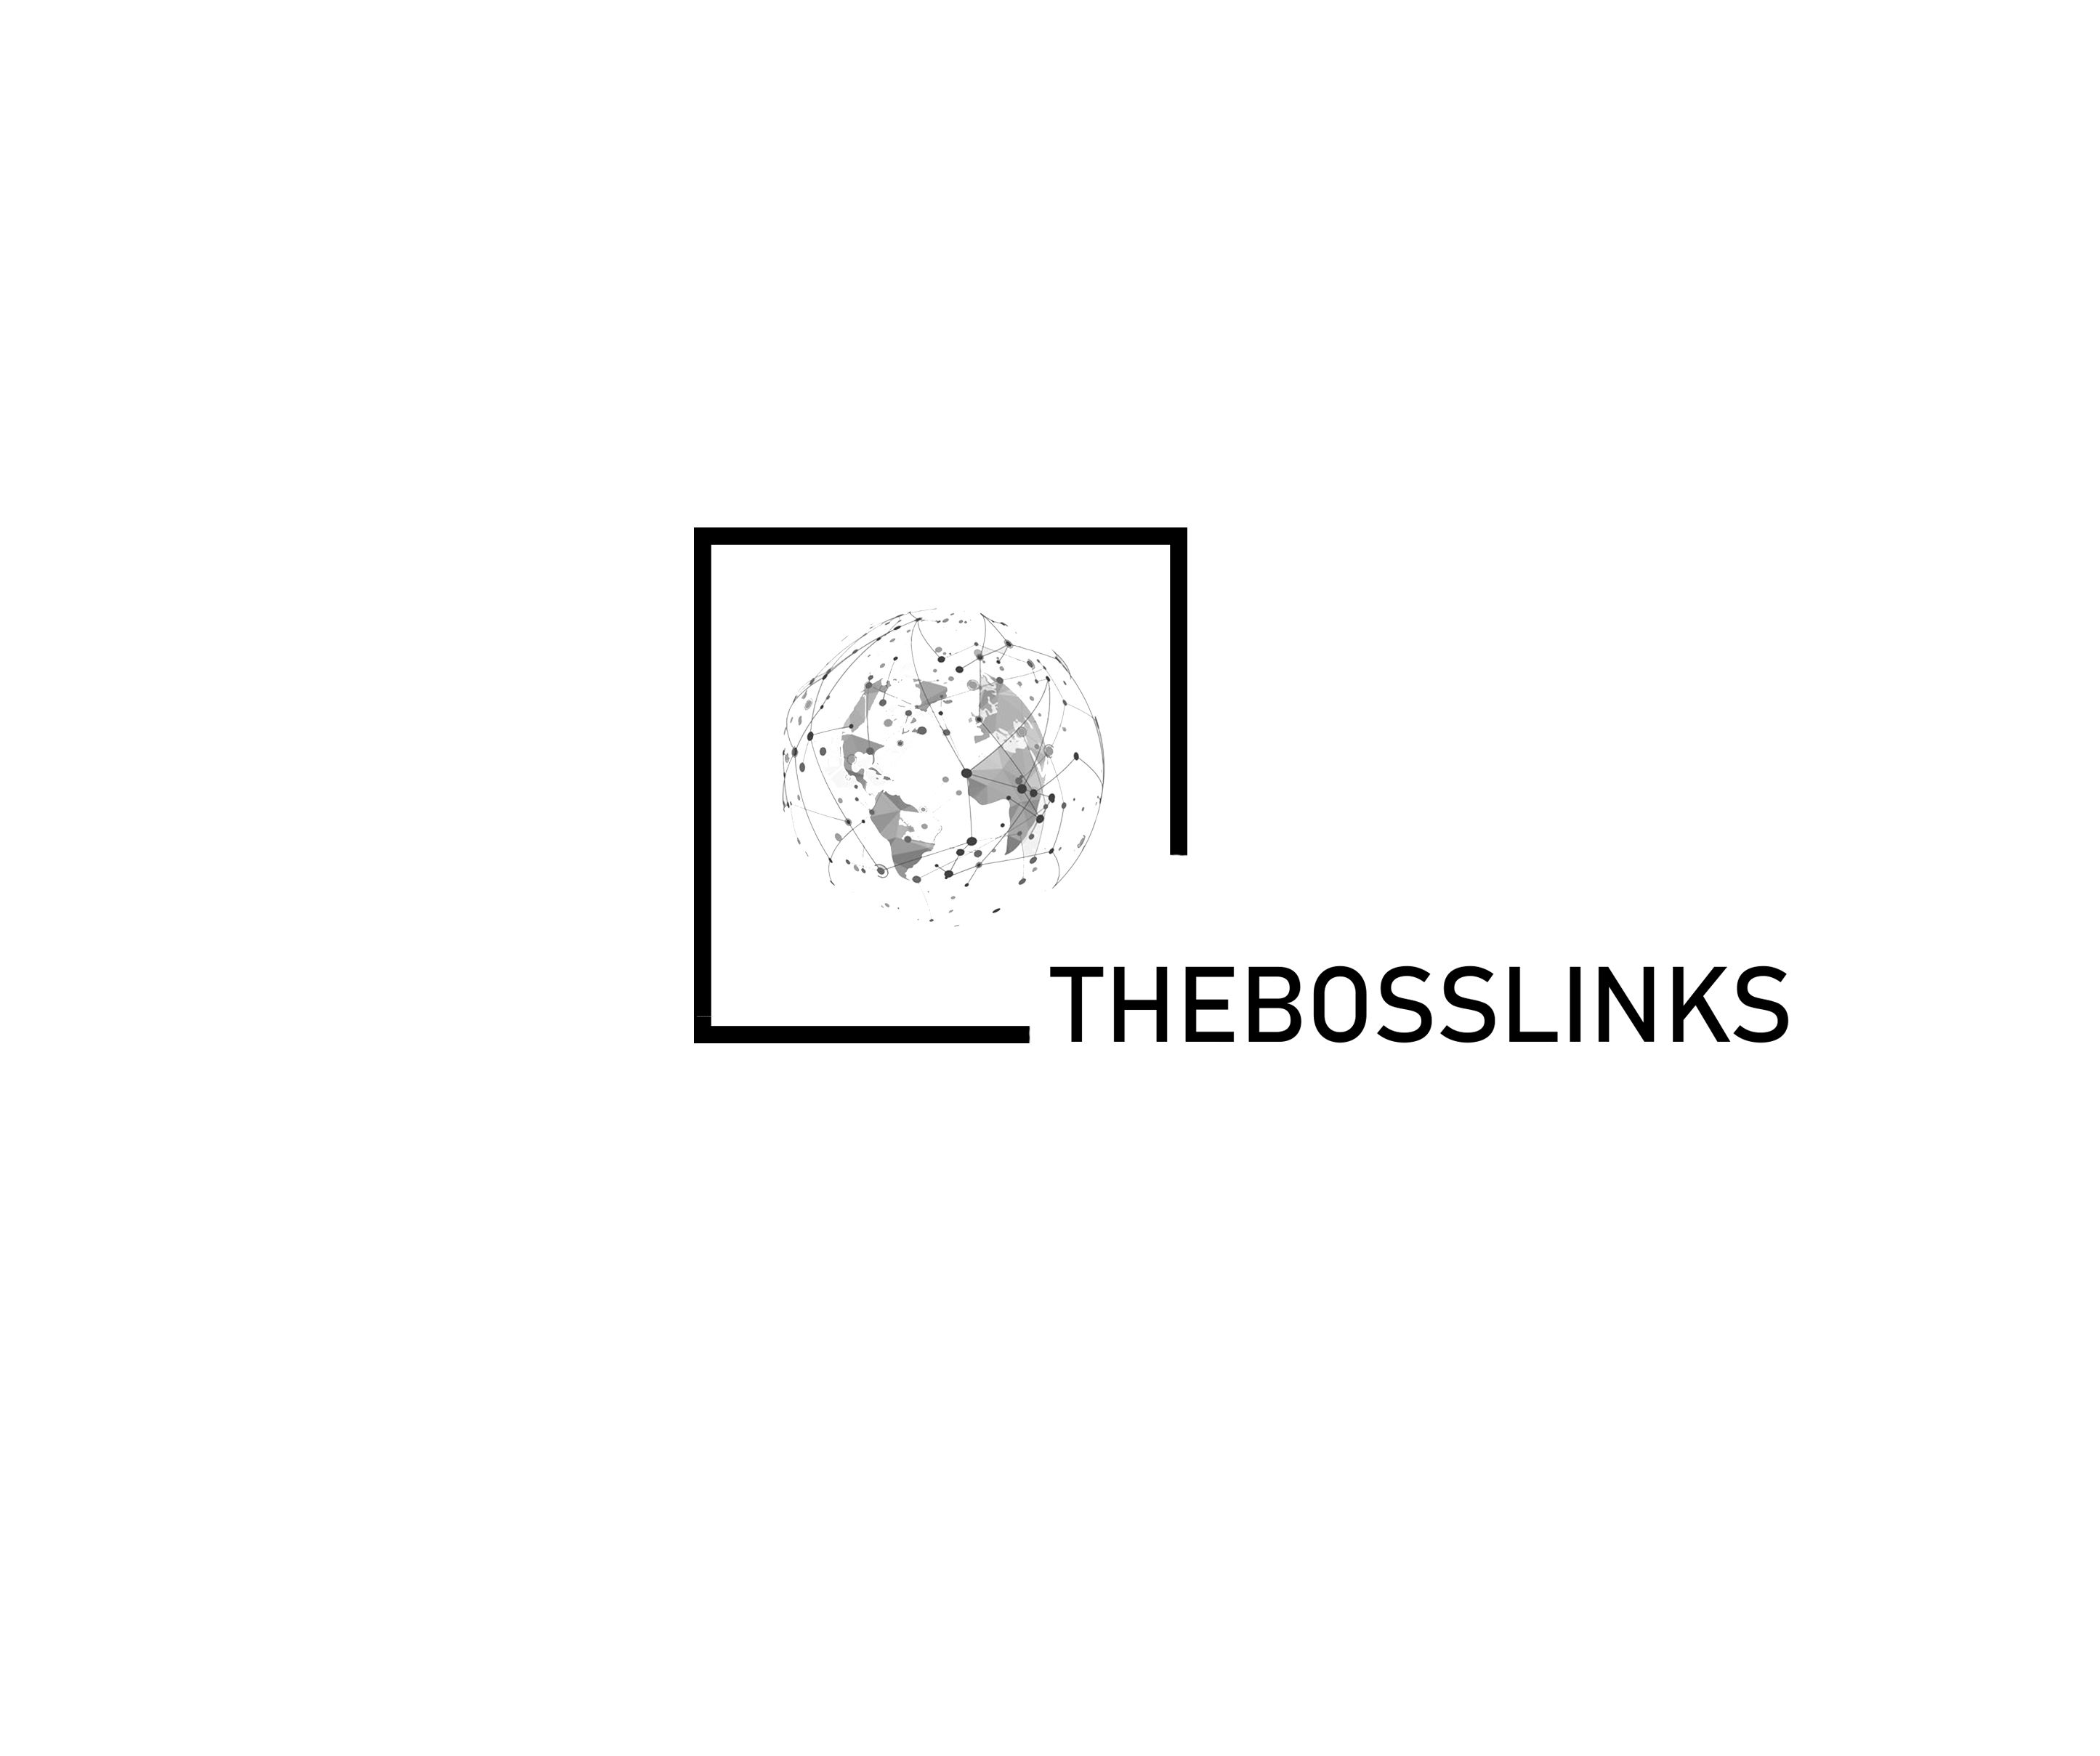 TheBossLinks